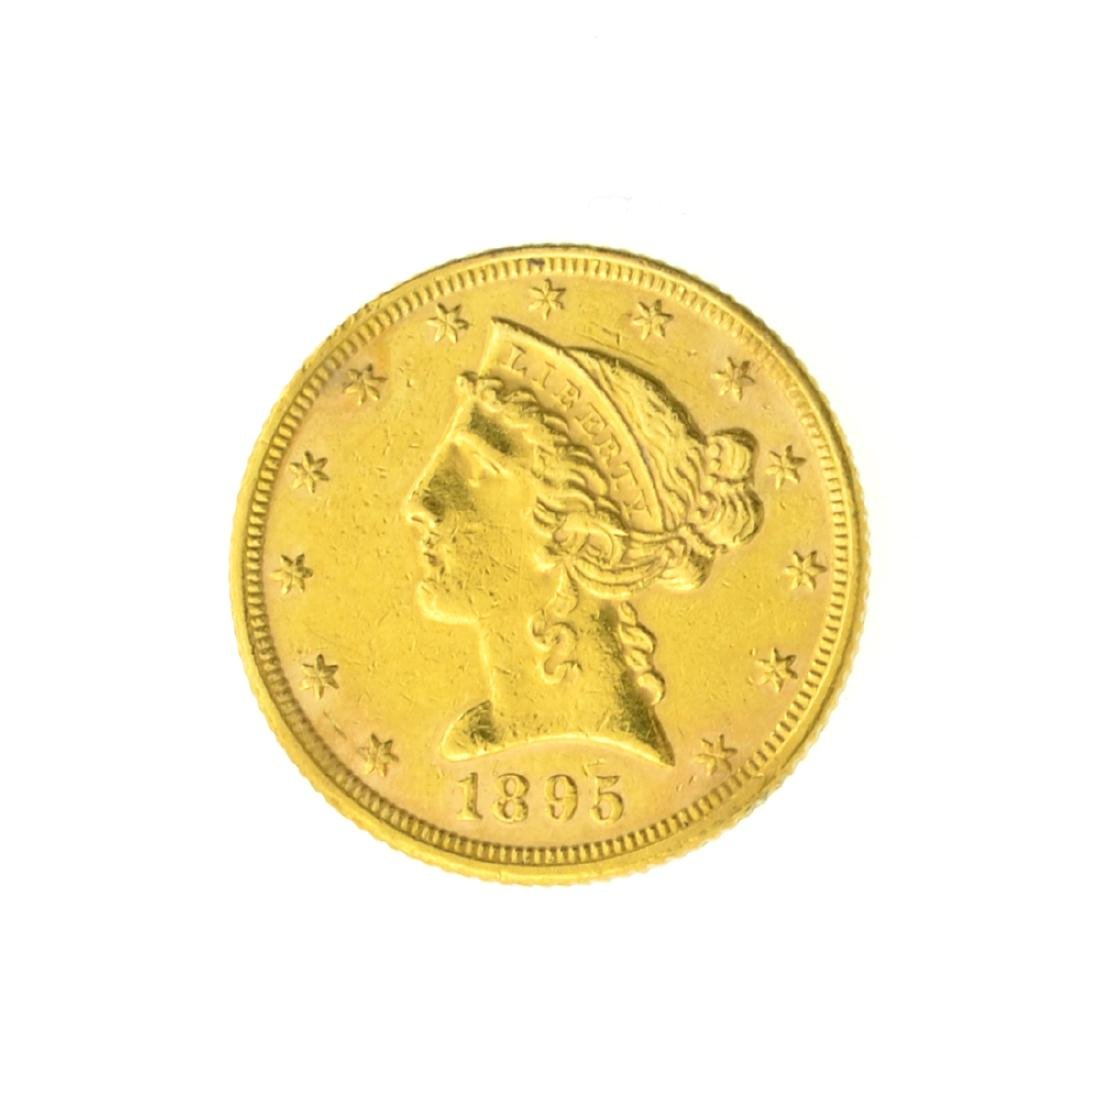 1895 $5.00 U.S. Liberty Head Gold Coin